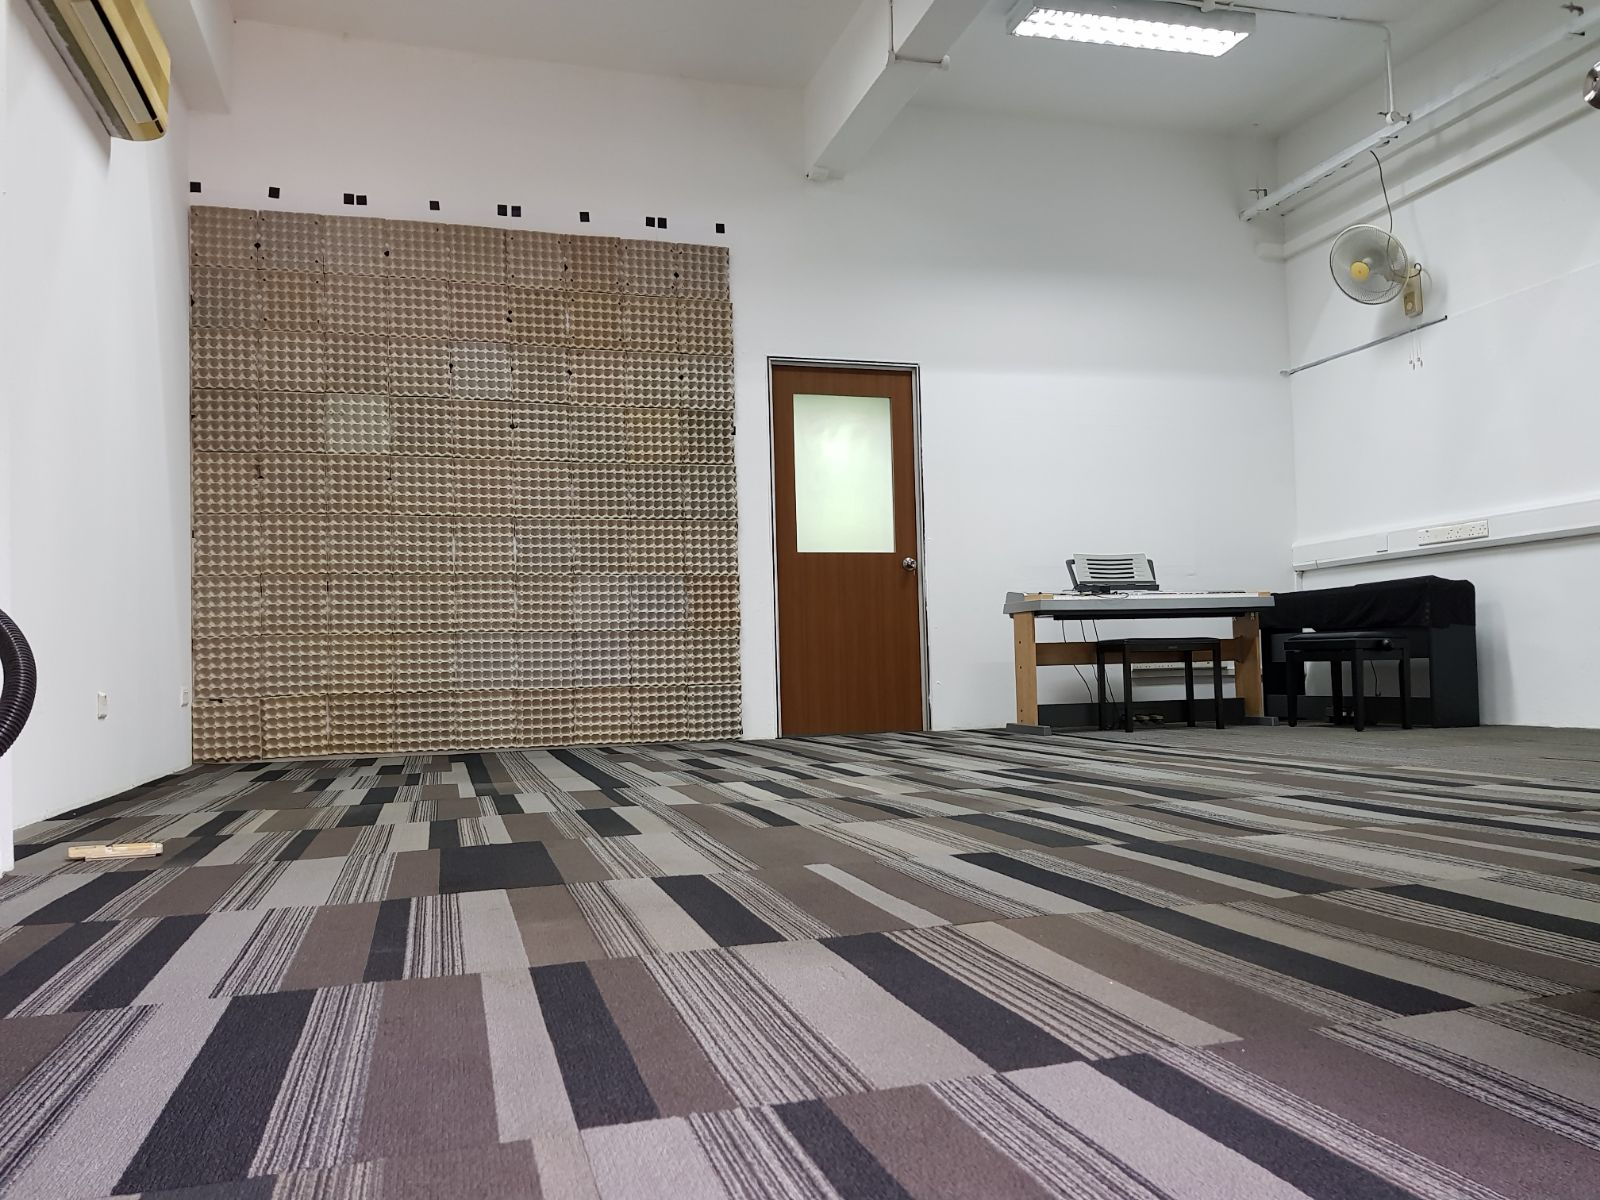 main room image 1